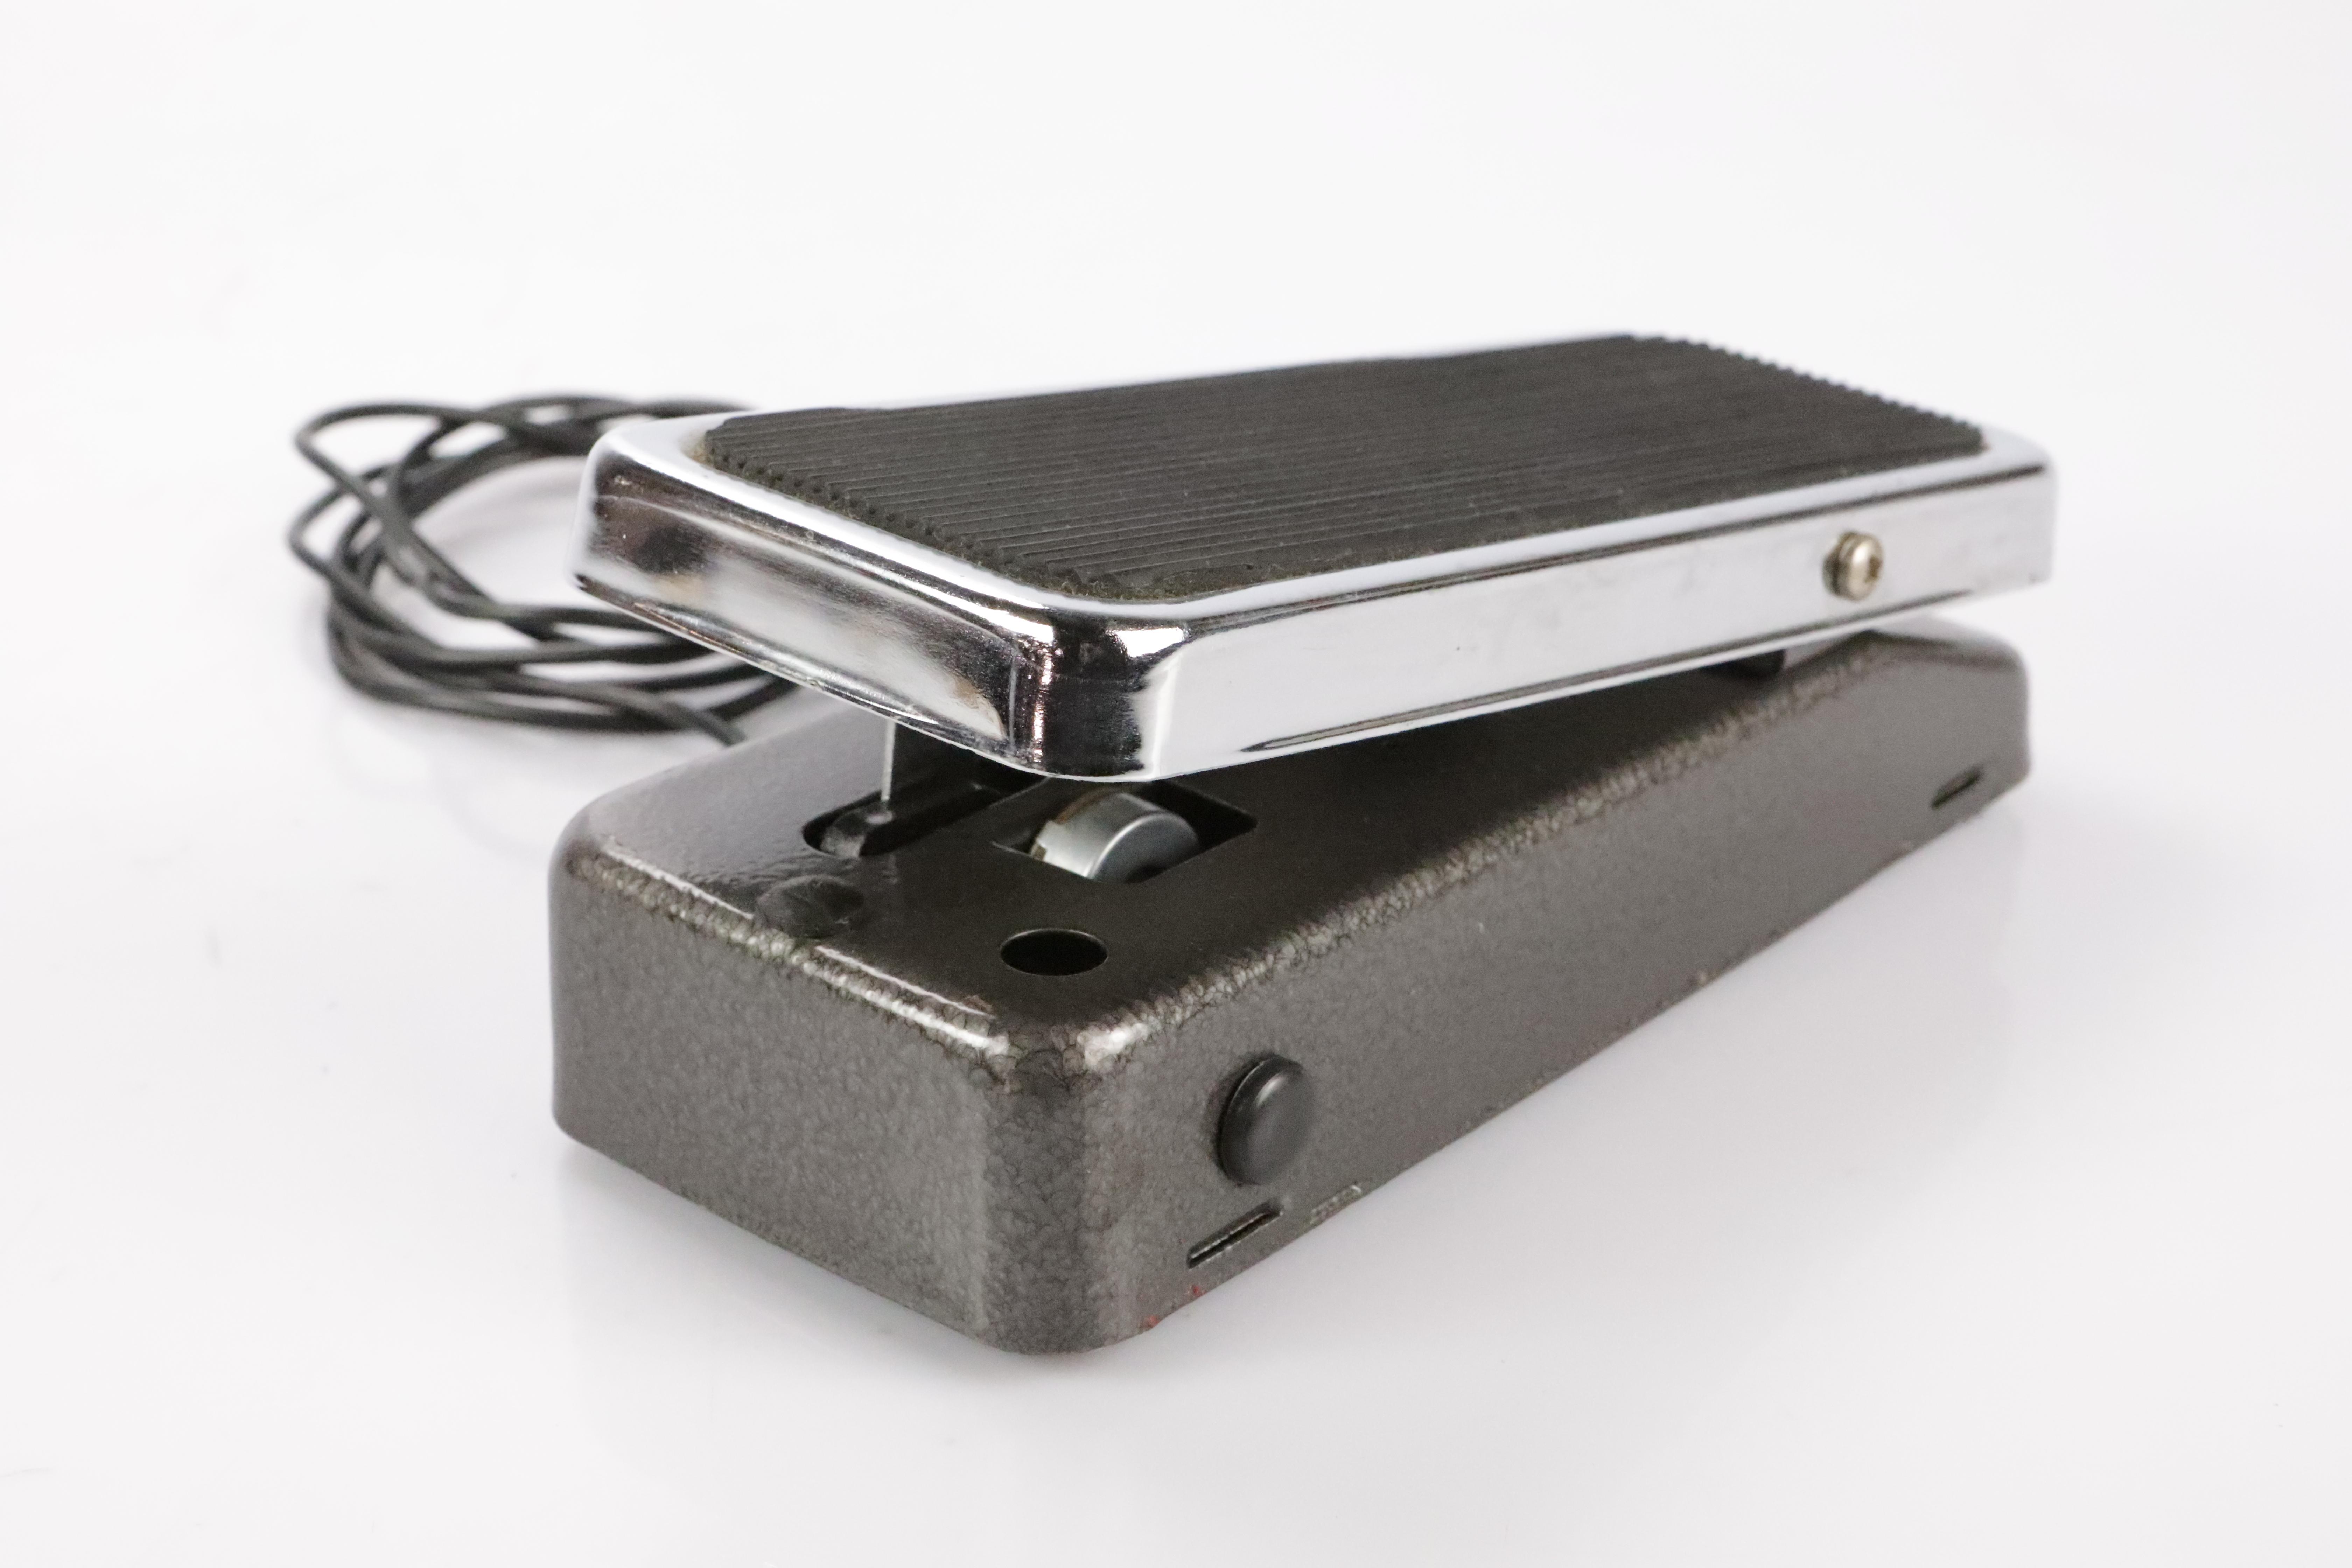 Vintage Colorsound Swell Volume Pedal  w/ 6' Mono Hardline Cable Mod #35448